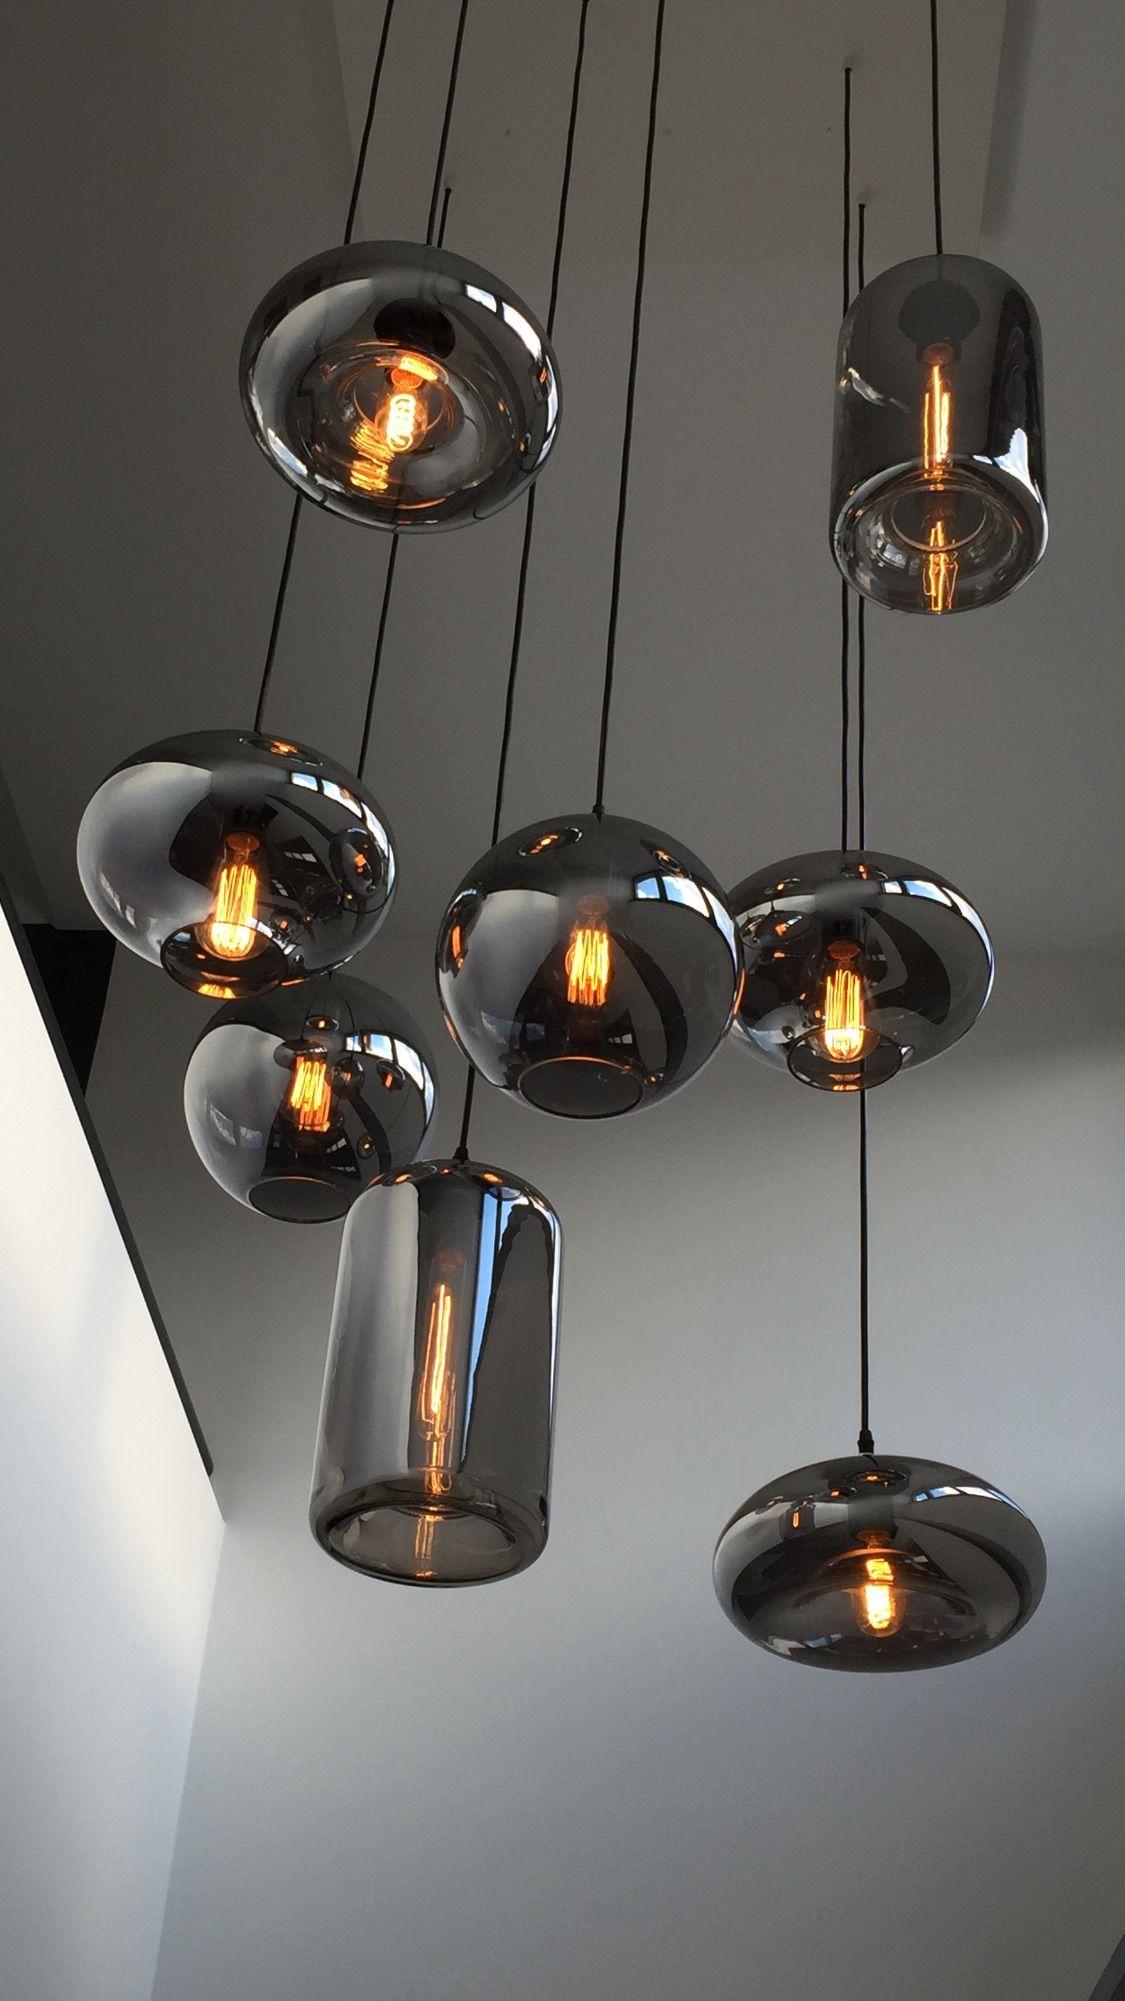 Verlichting Italian Furniture Design Trendy Lighting Home Lighting